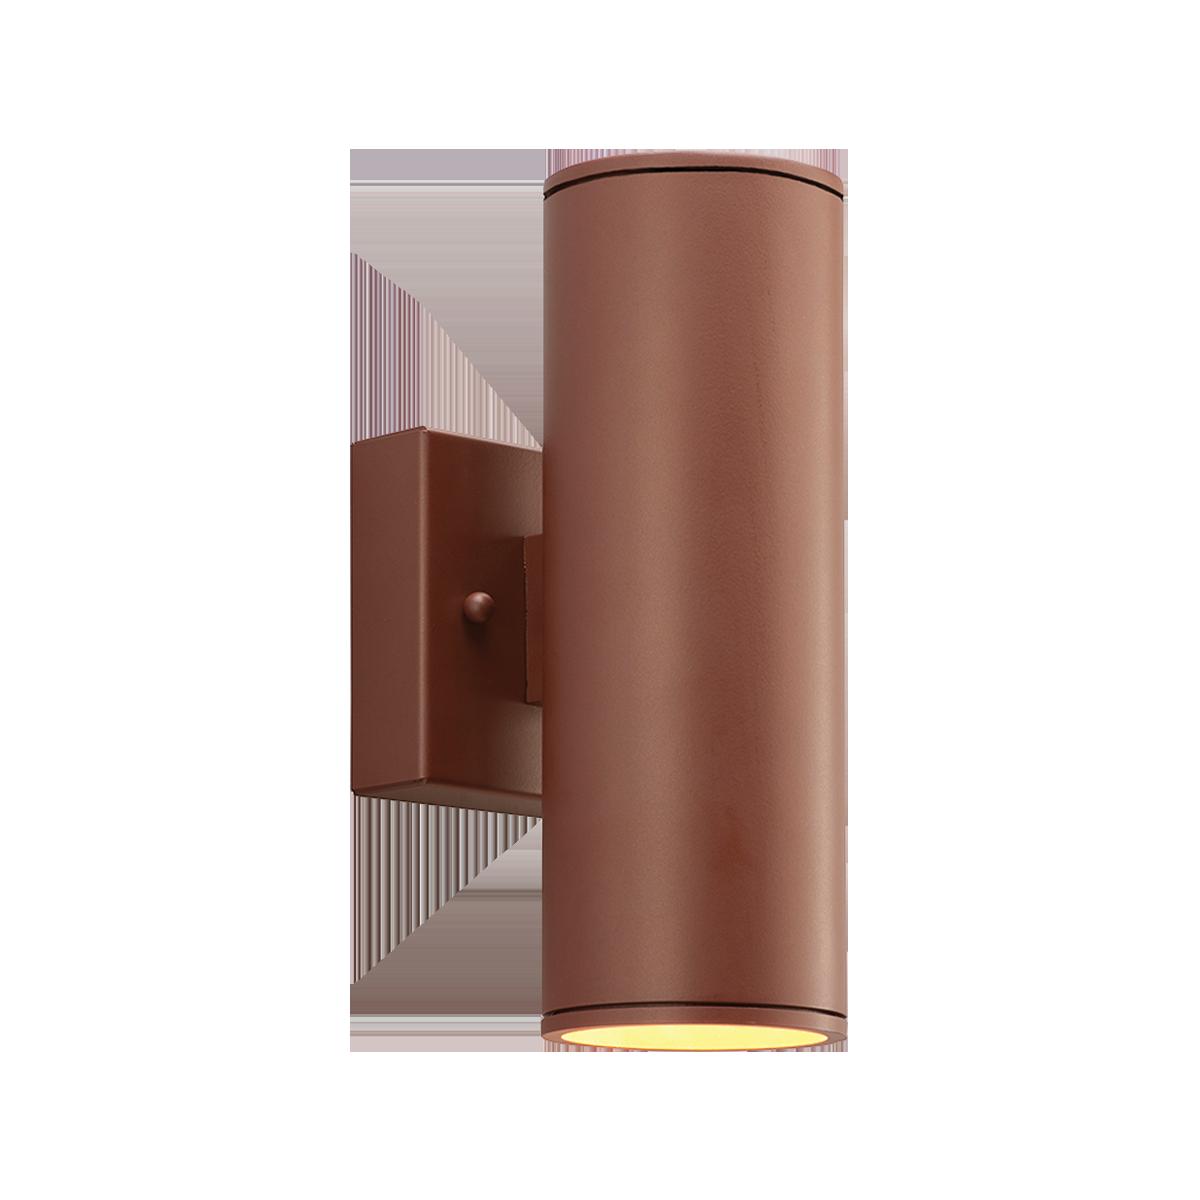 "2"" Round LED Wall Mount Downlight Cylinder, 3500K  -  90 CRI"